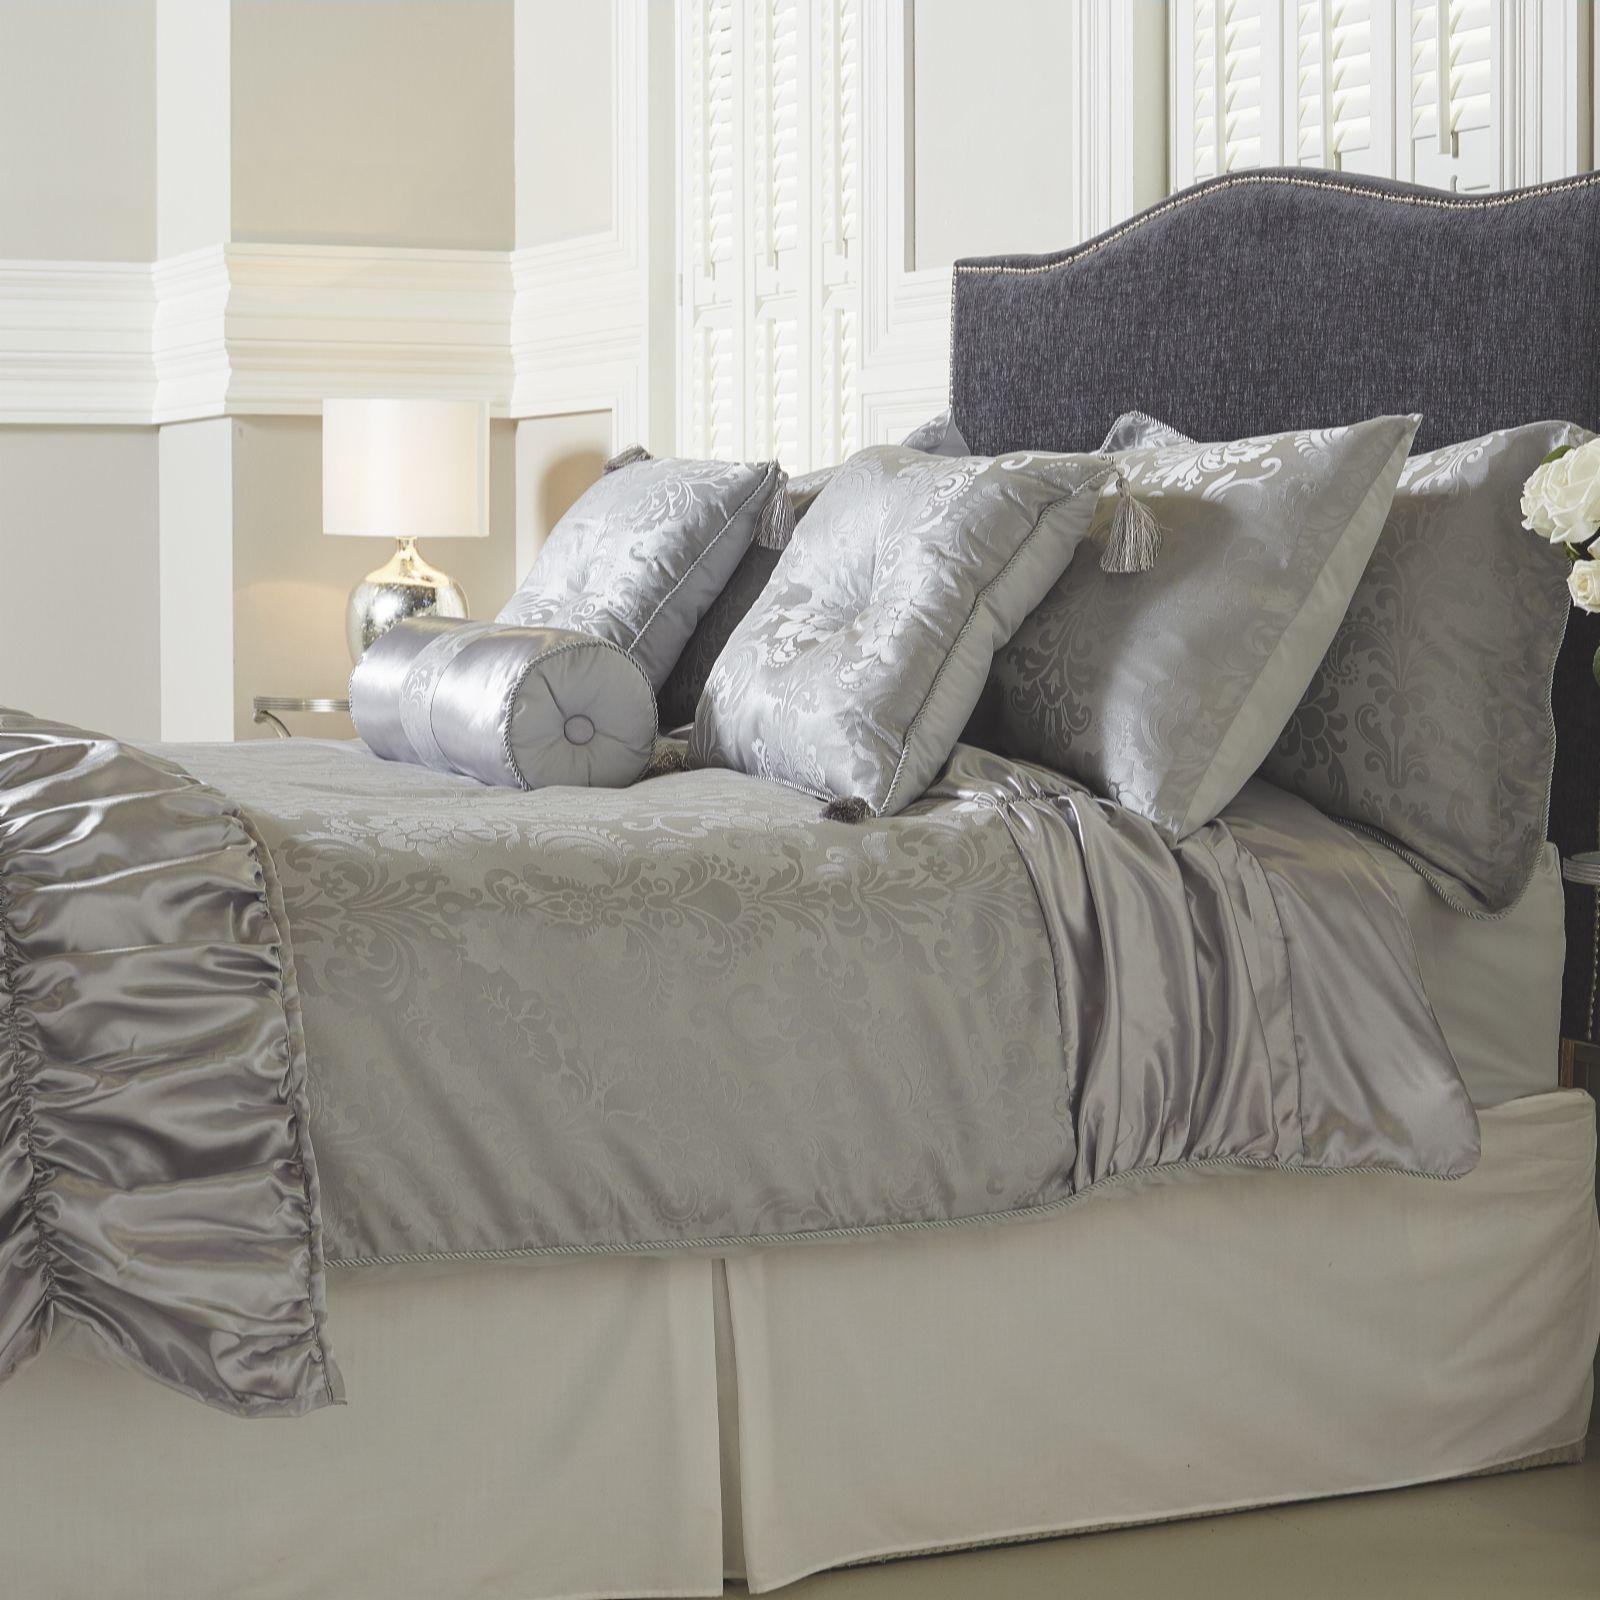 Mayfair Manor Ruffle Satin Damask Jacquard 10 Piece Bedding ...